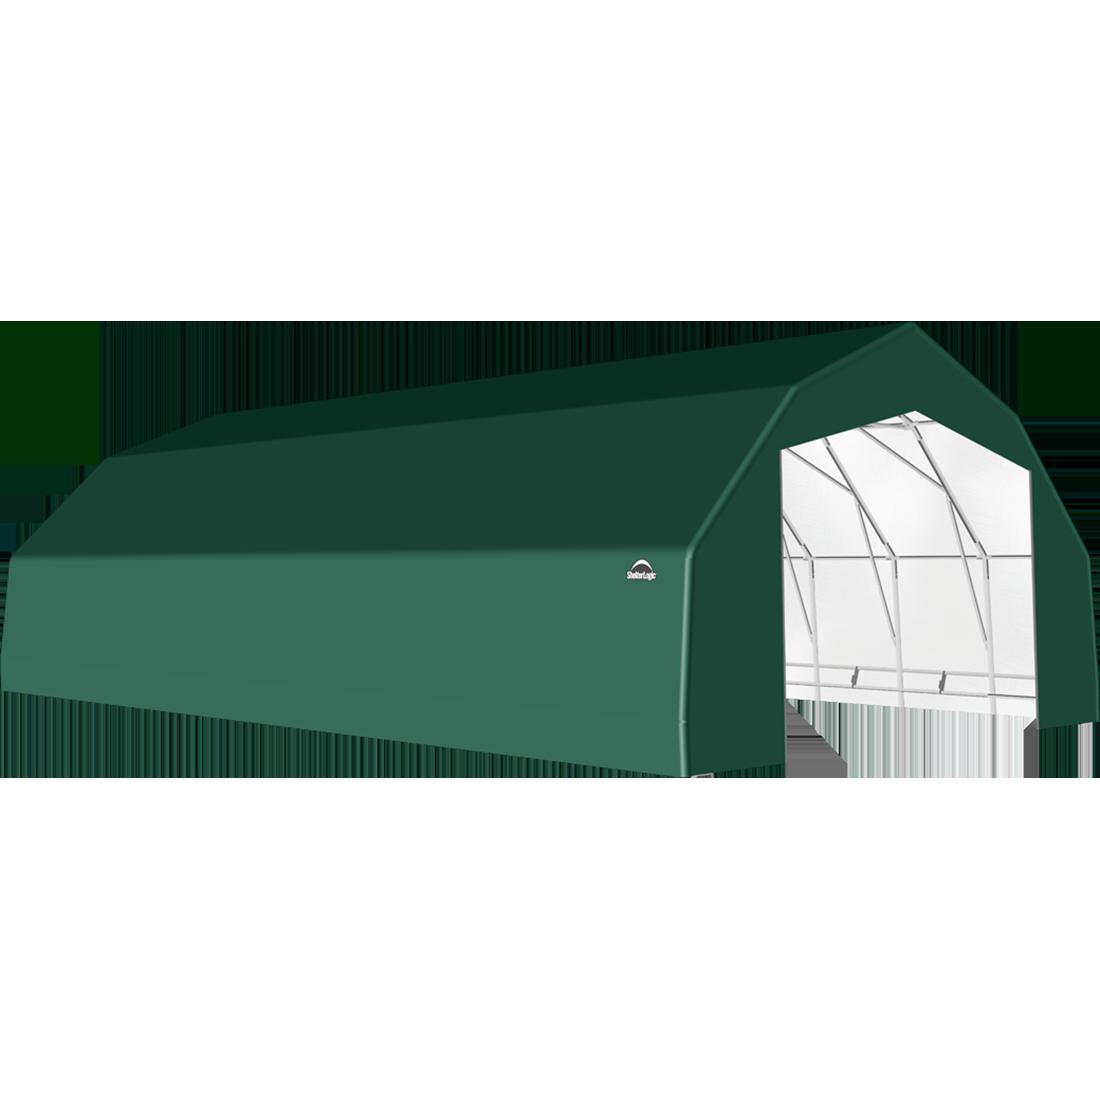 ShelterTech SP Series Barn Shelter, 25 ft. x 48 ft. x 14 ft. Heavy Duty PVC 14.5 oz. Green